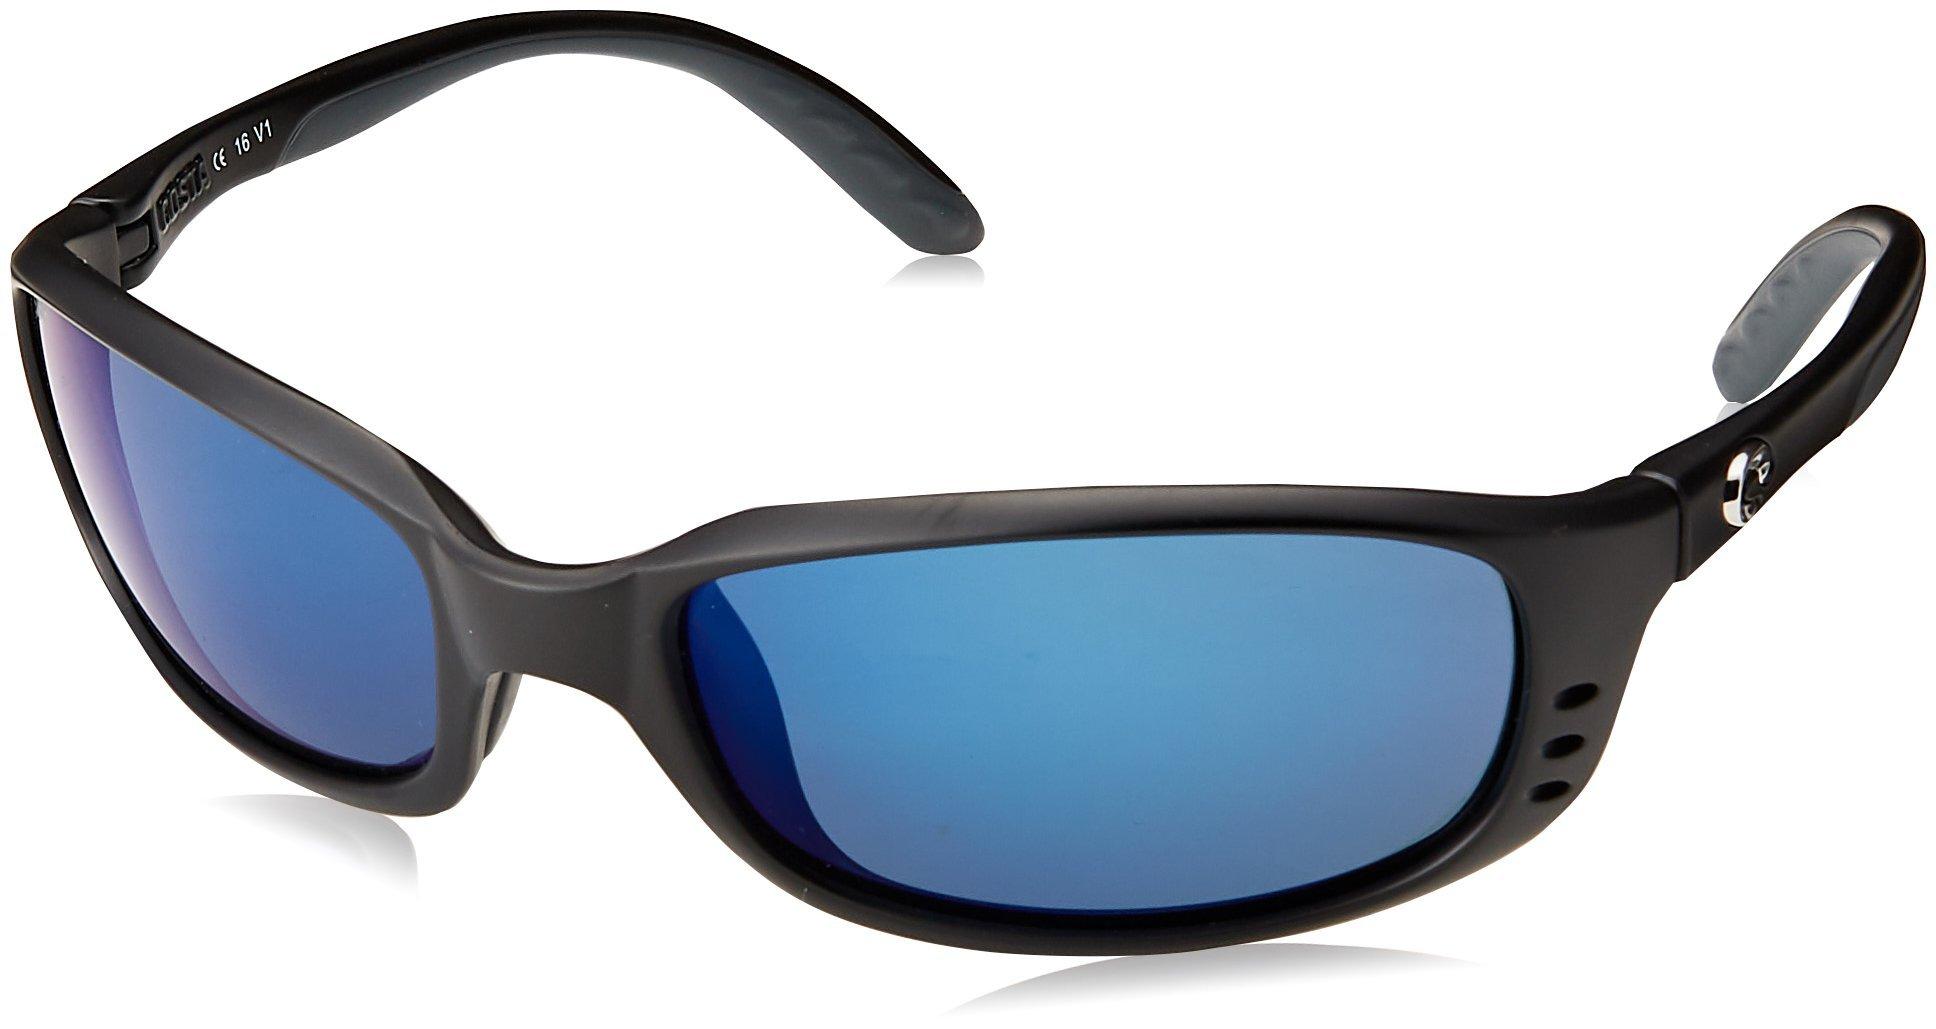 Costa Del Mar Brine Sunglasses, Gunmetal, Blue Mirror 580G Lens